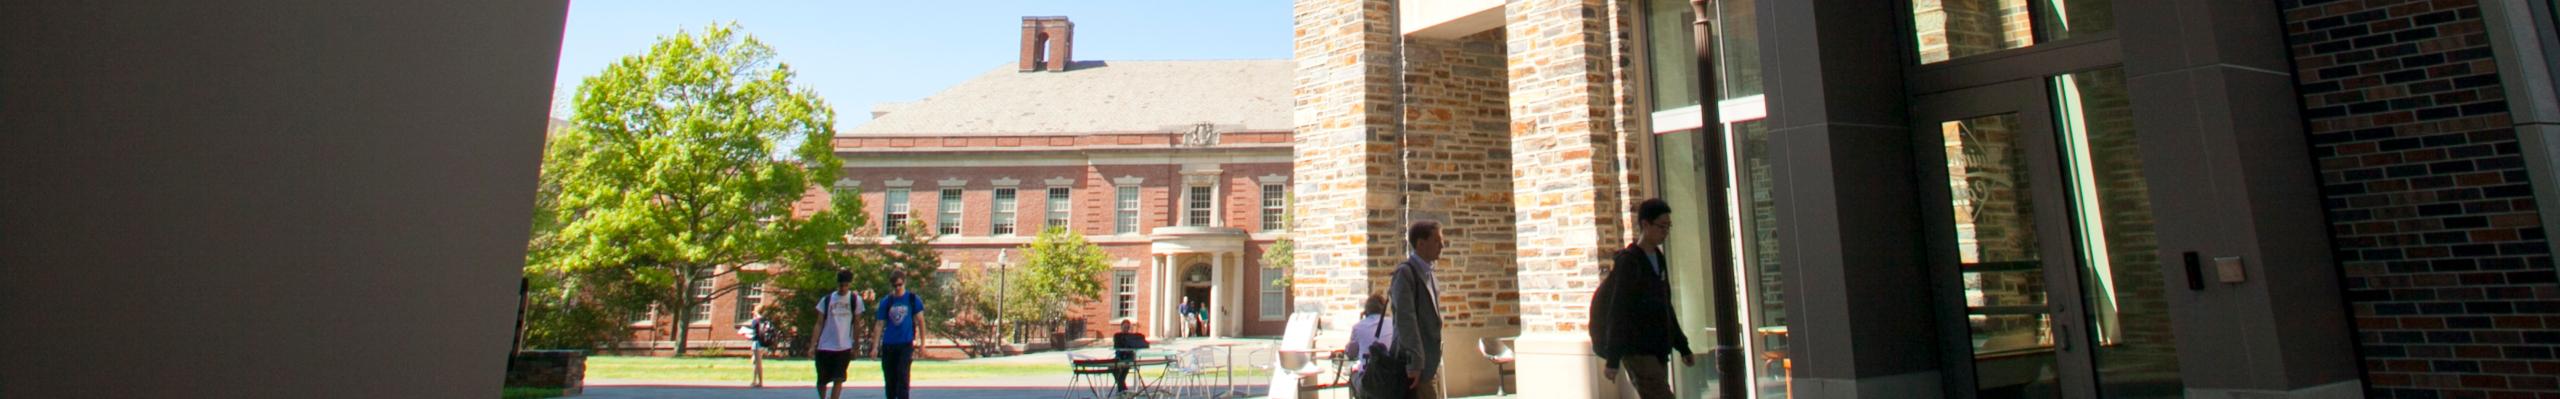 Duke's Hudson Hall seen through an archway